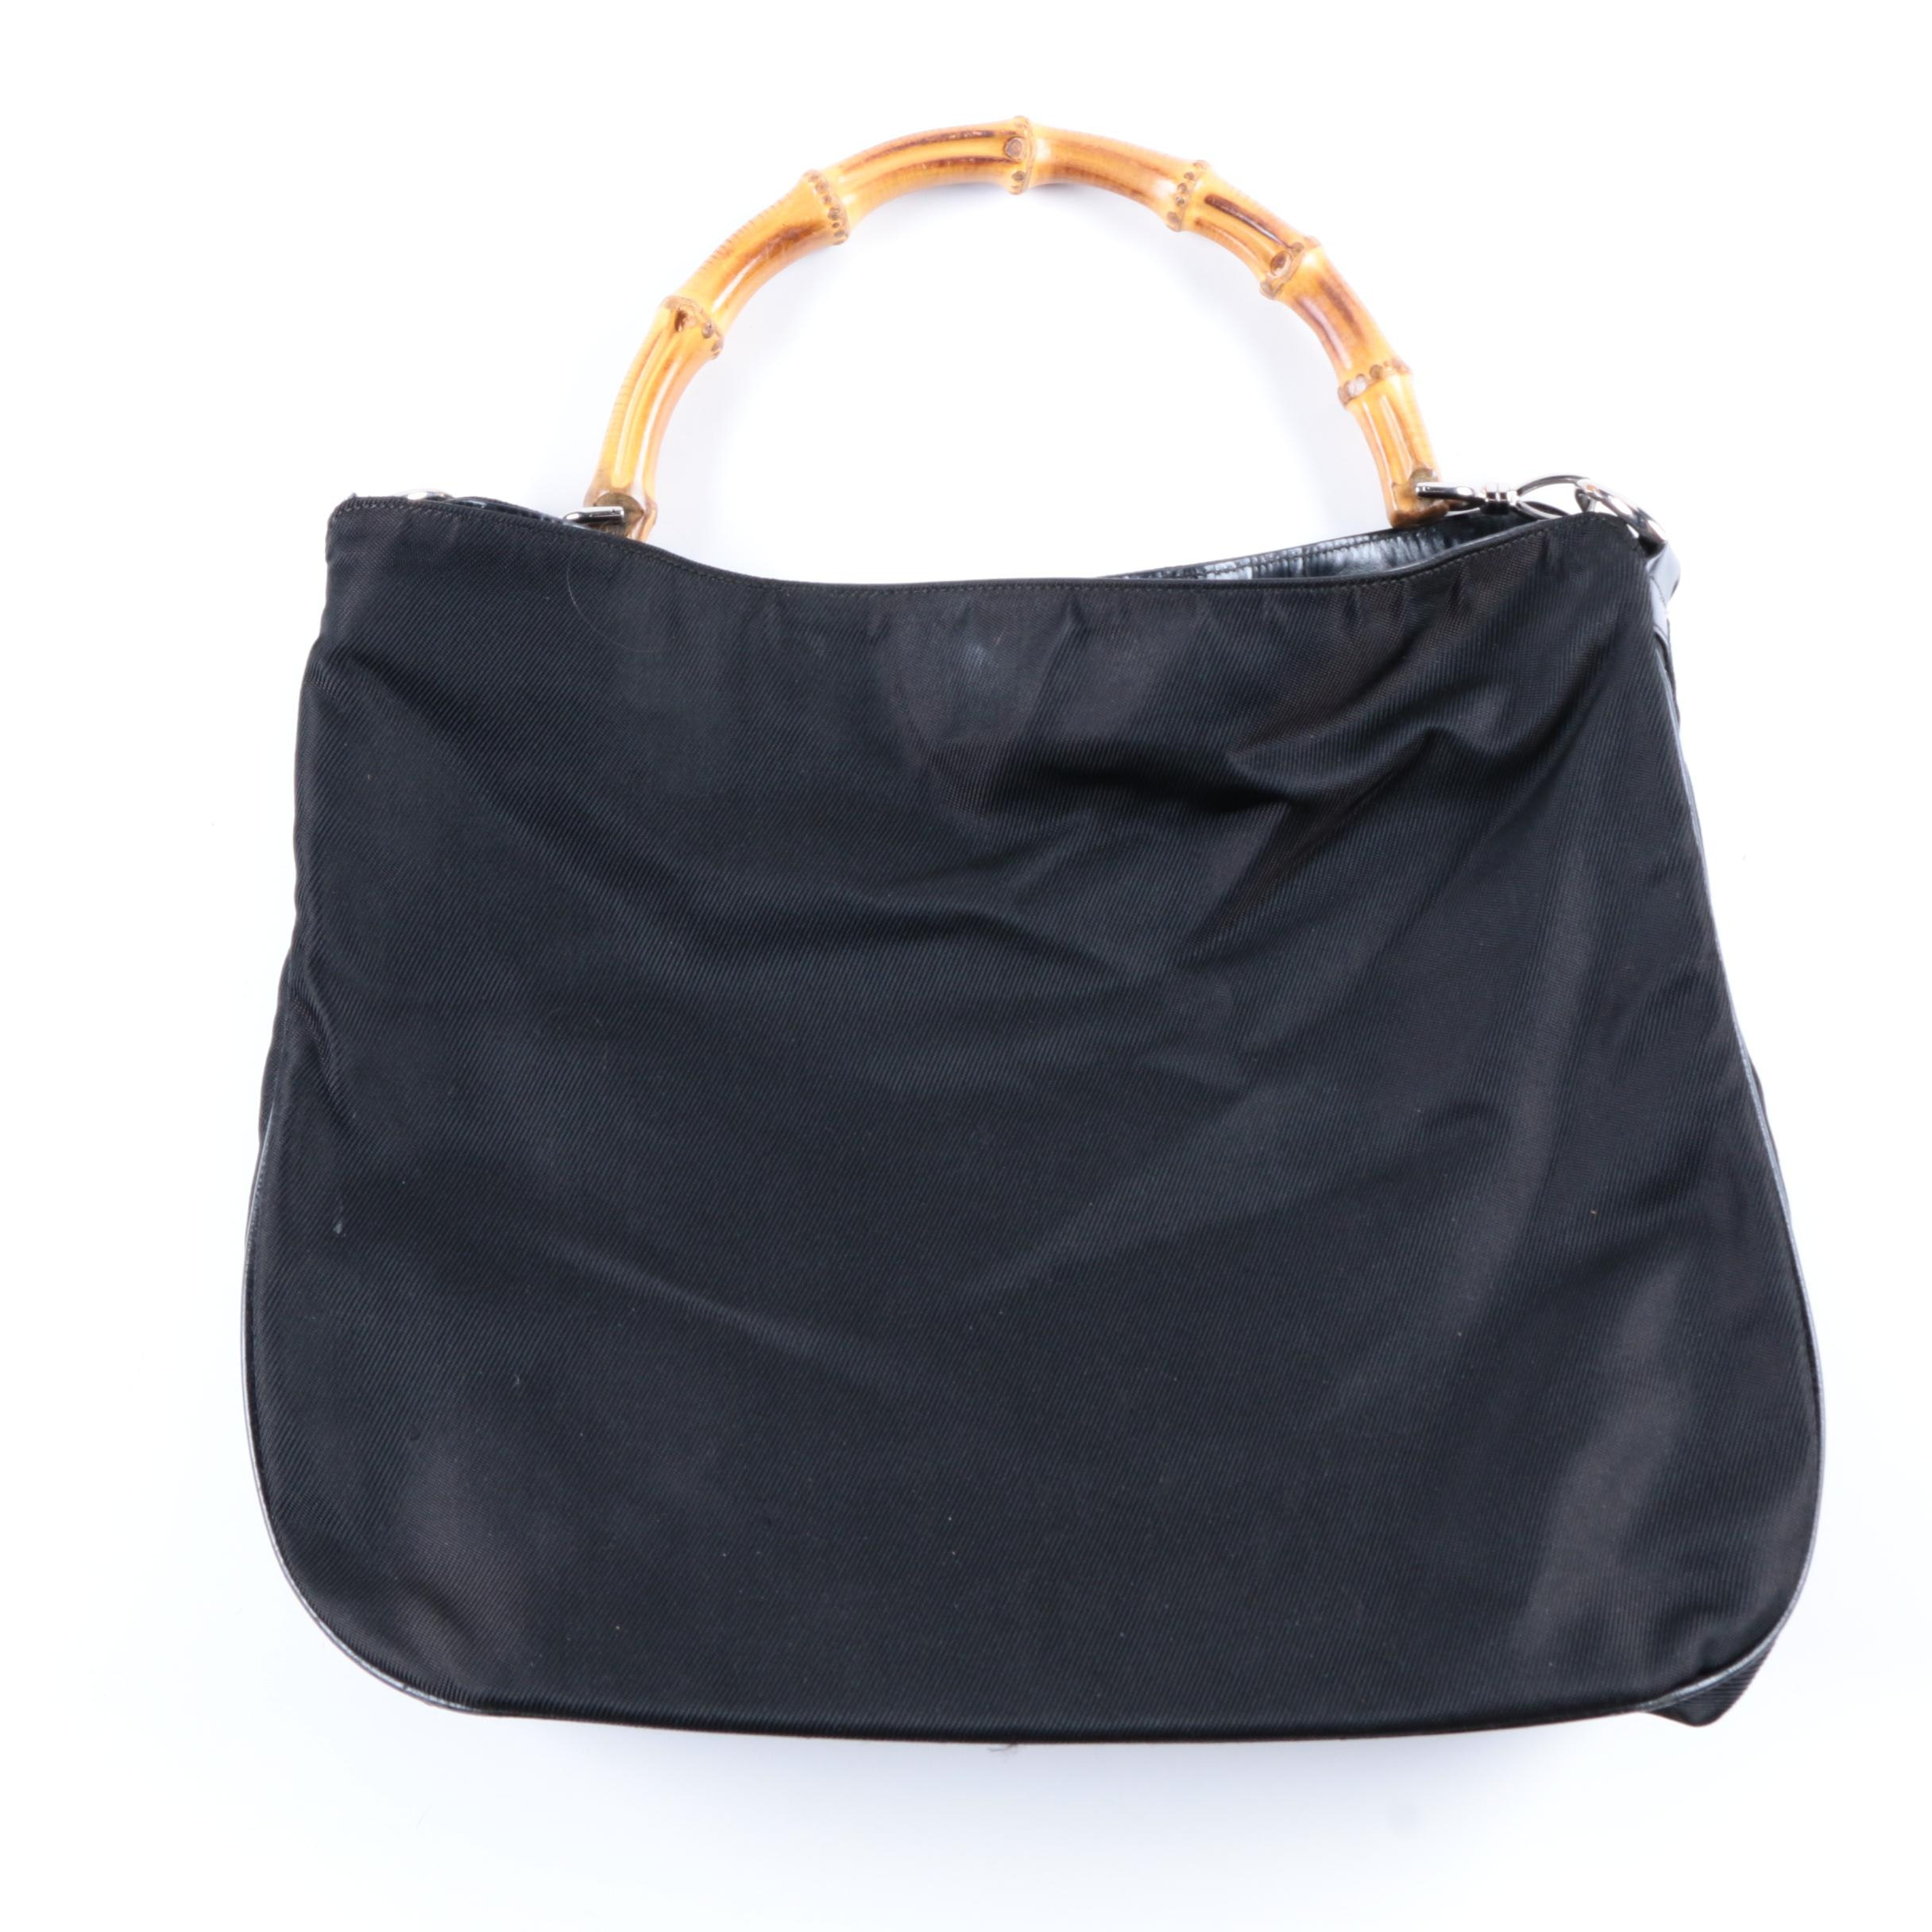 Gucci Bamboo Handle Shoulder Bag